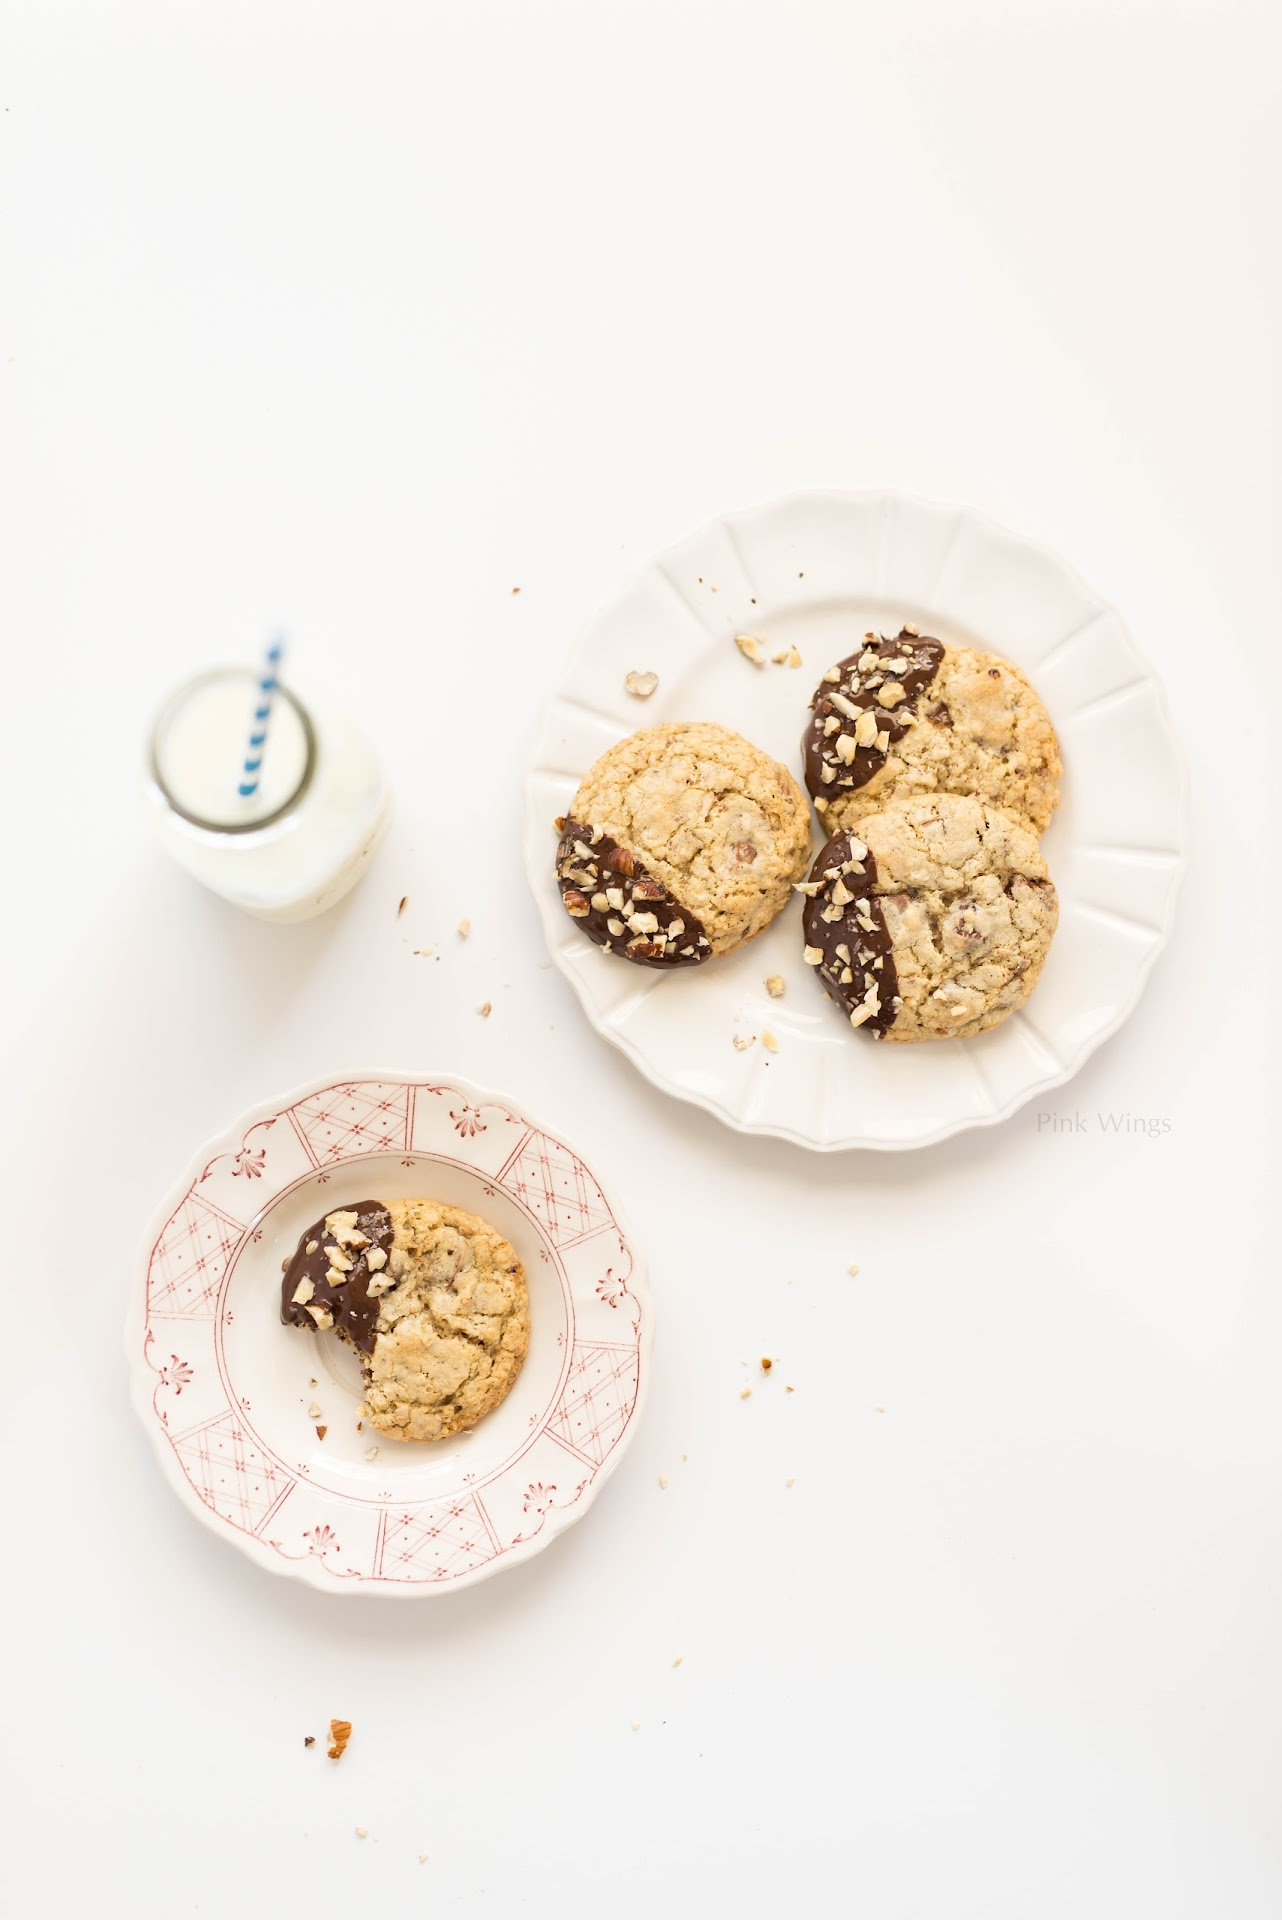 toffee, chocolate, ritter dark chocolate, german european chocolate, hazelnut dessert, milk and cookies, photography, lds mormon food blogger, san francisco bay area, recipe